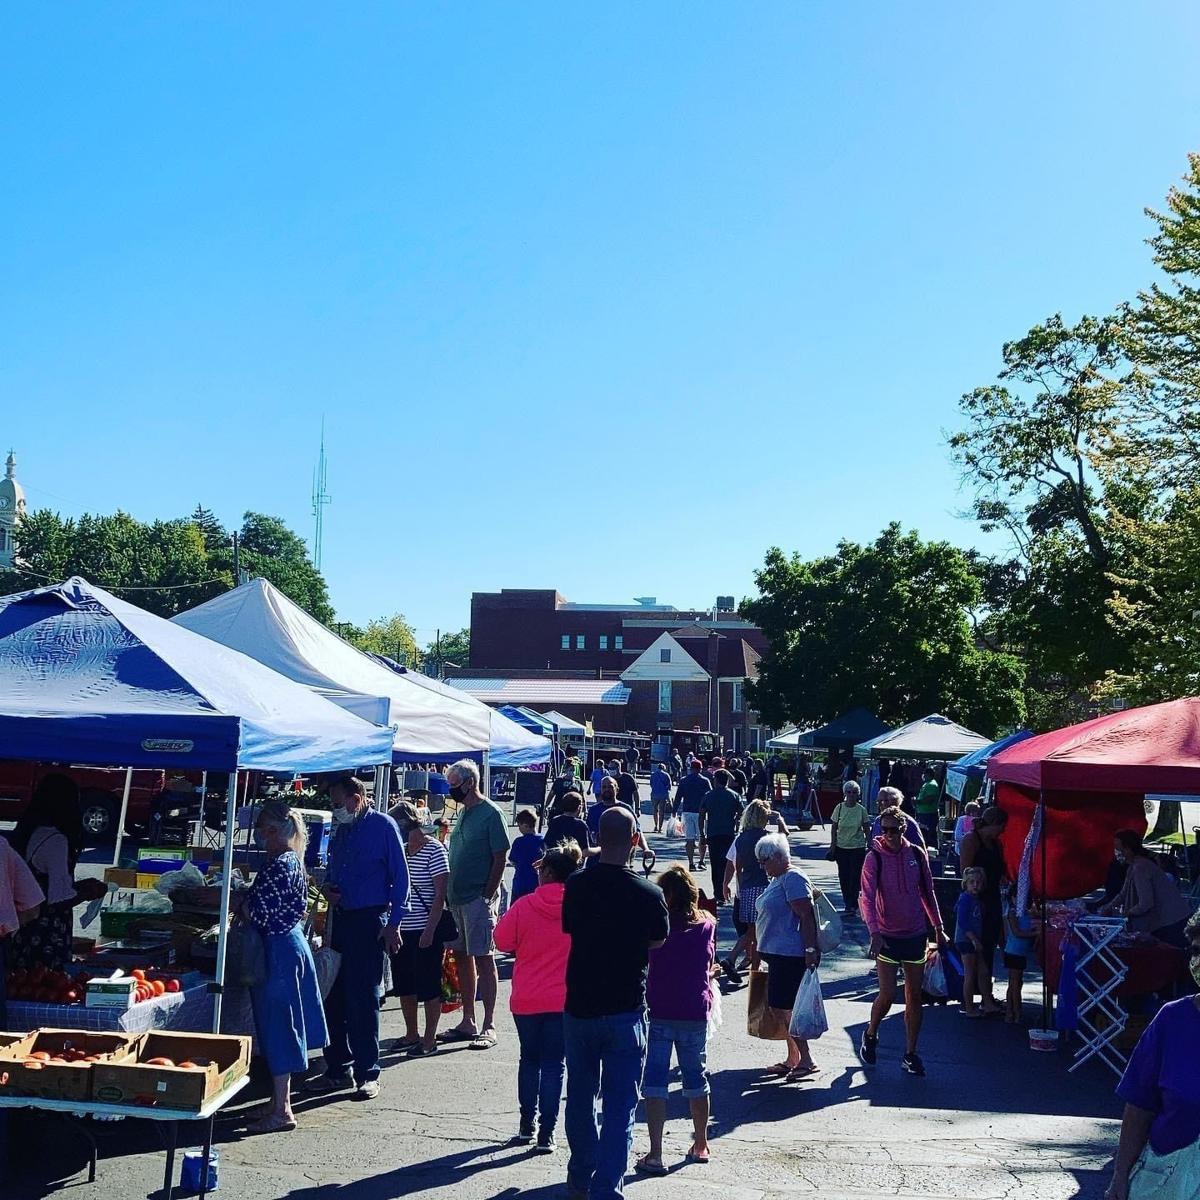 Downtown Wabash Farmers' Market kicking off on Saturday